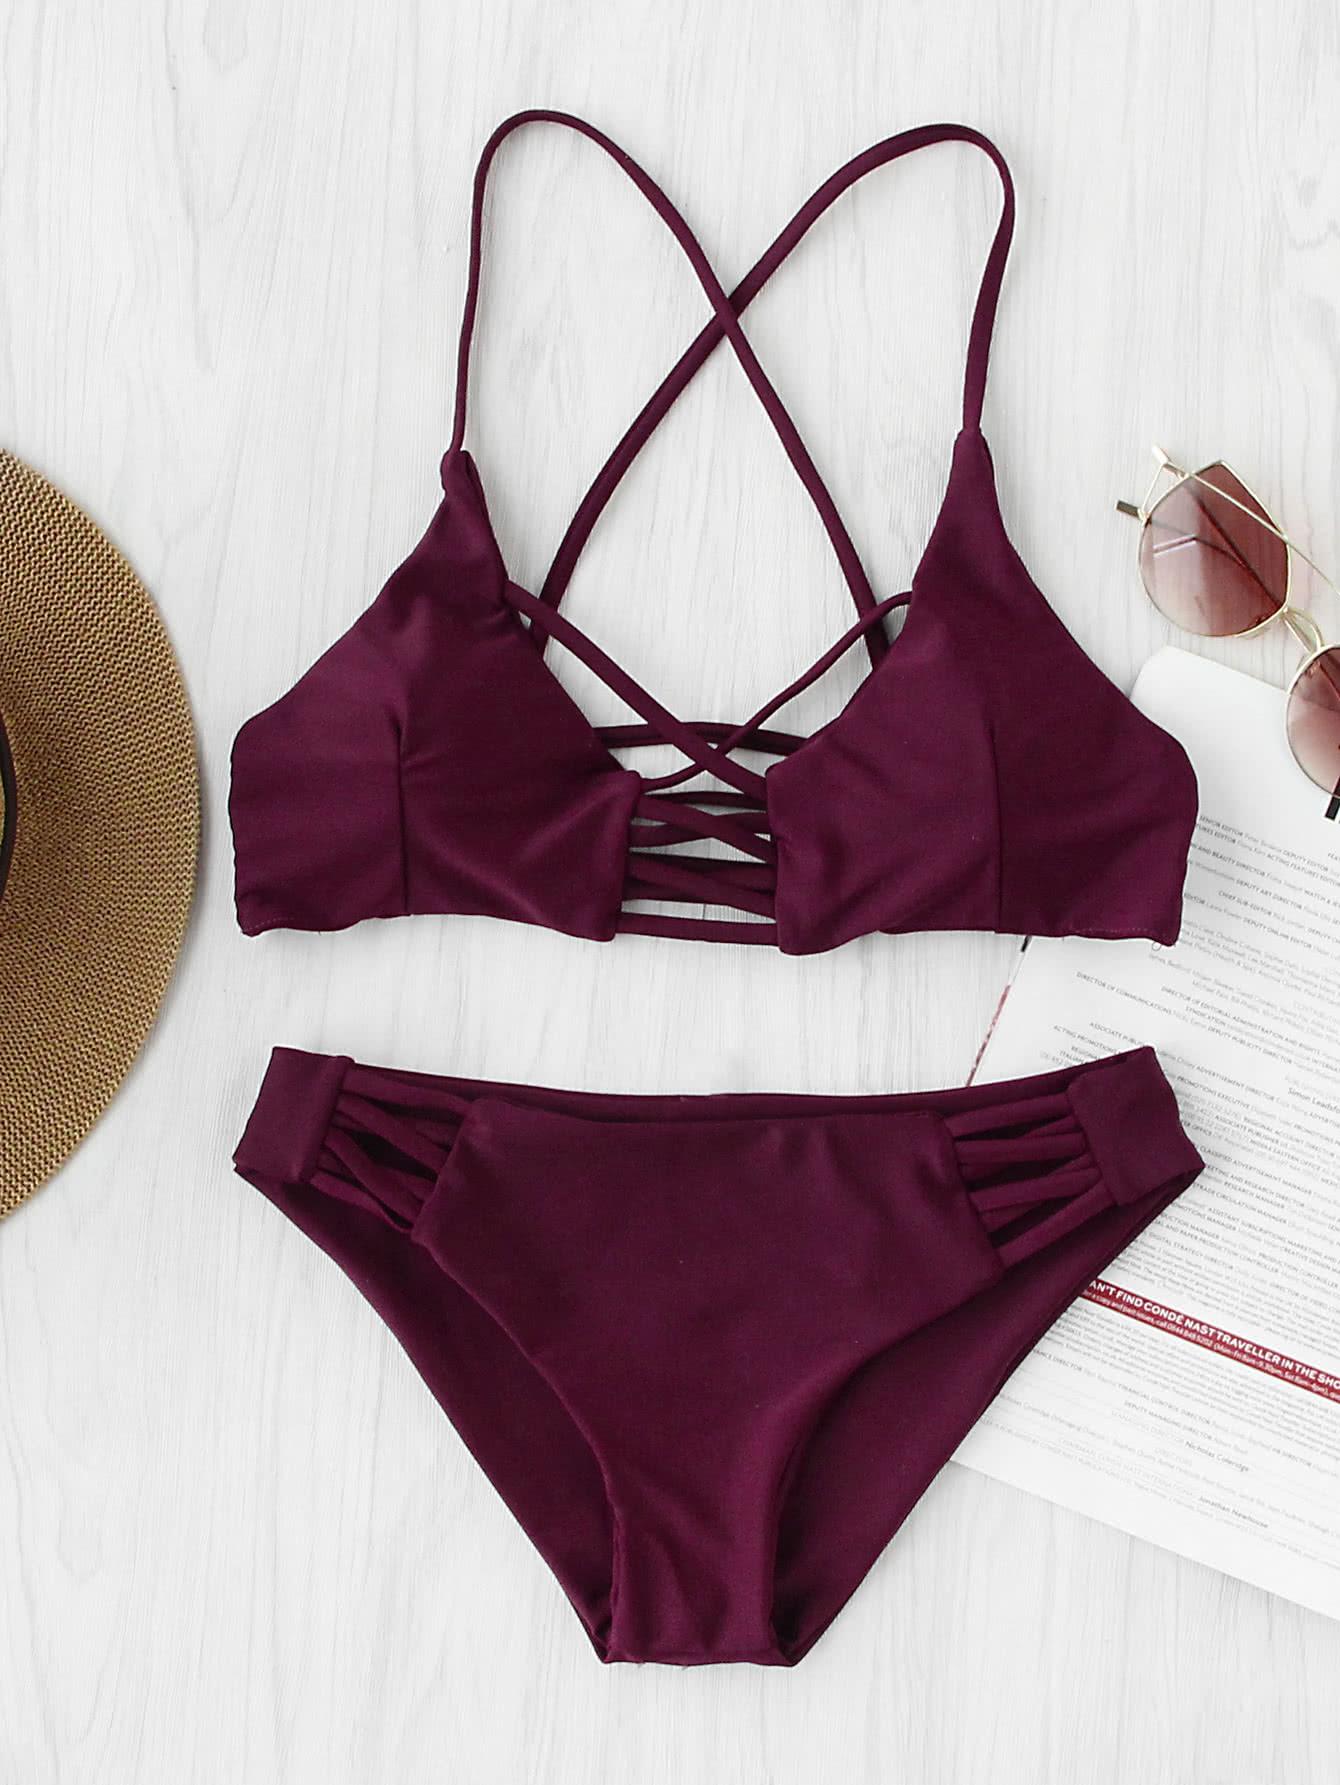 Criss Cross Cutout Beach Bikini Set criss cross ruffle bikini set